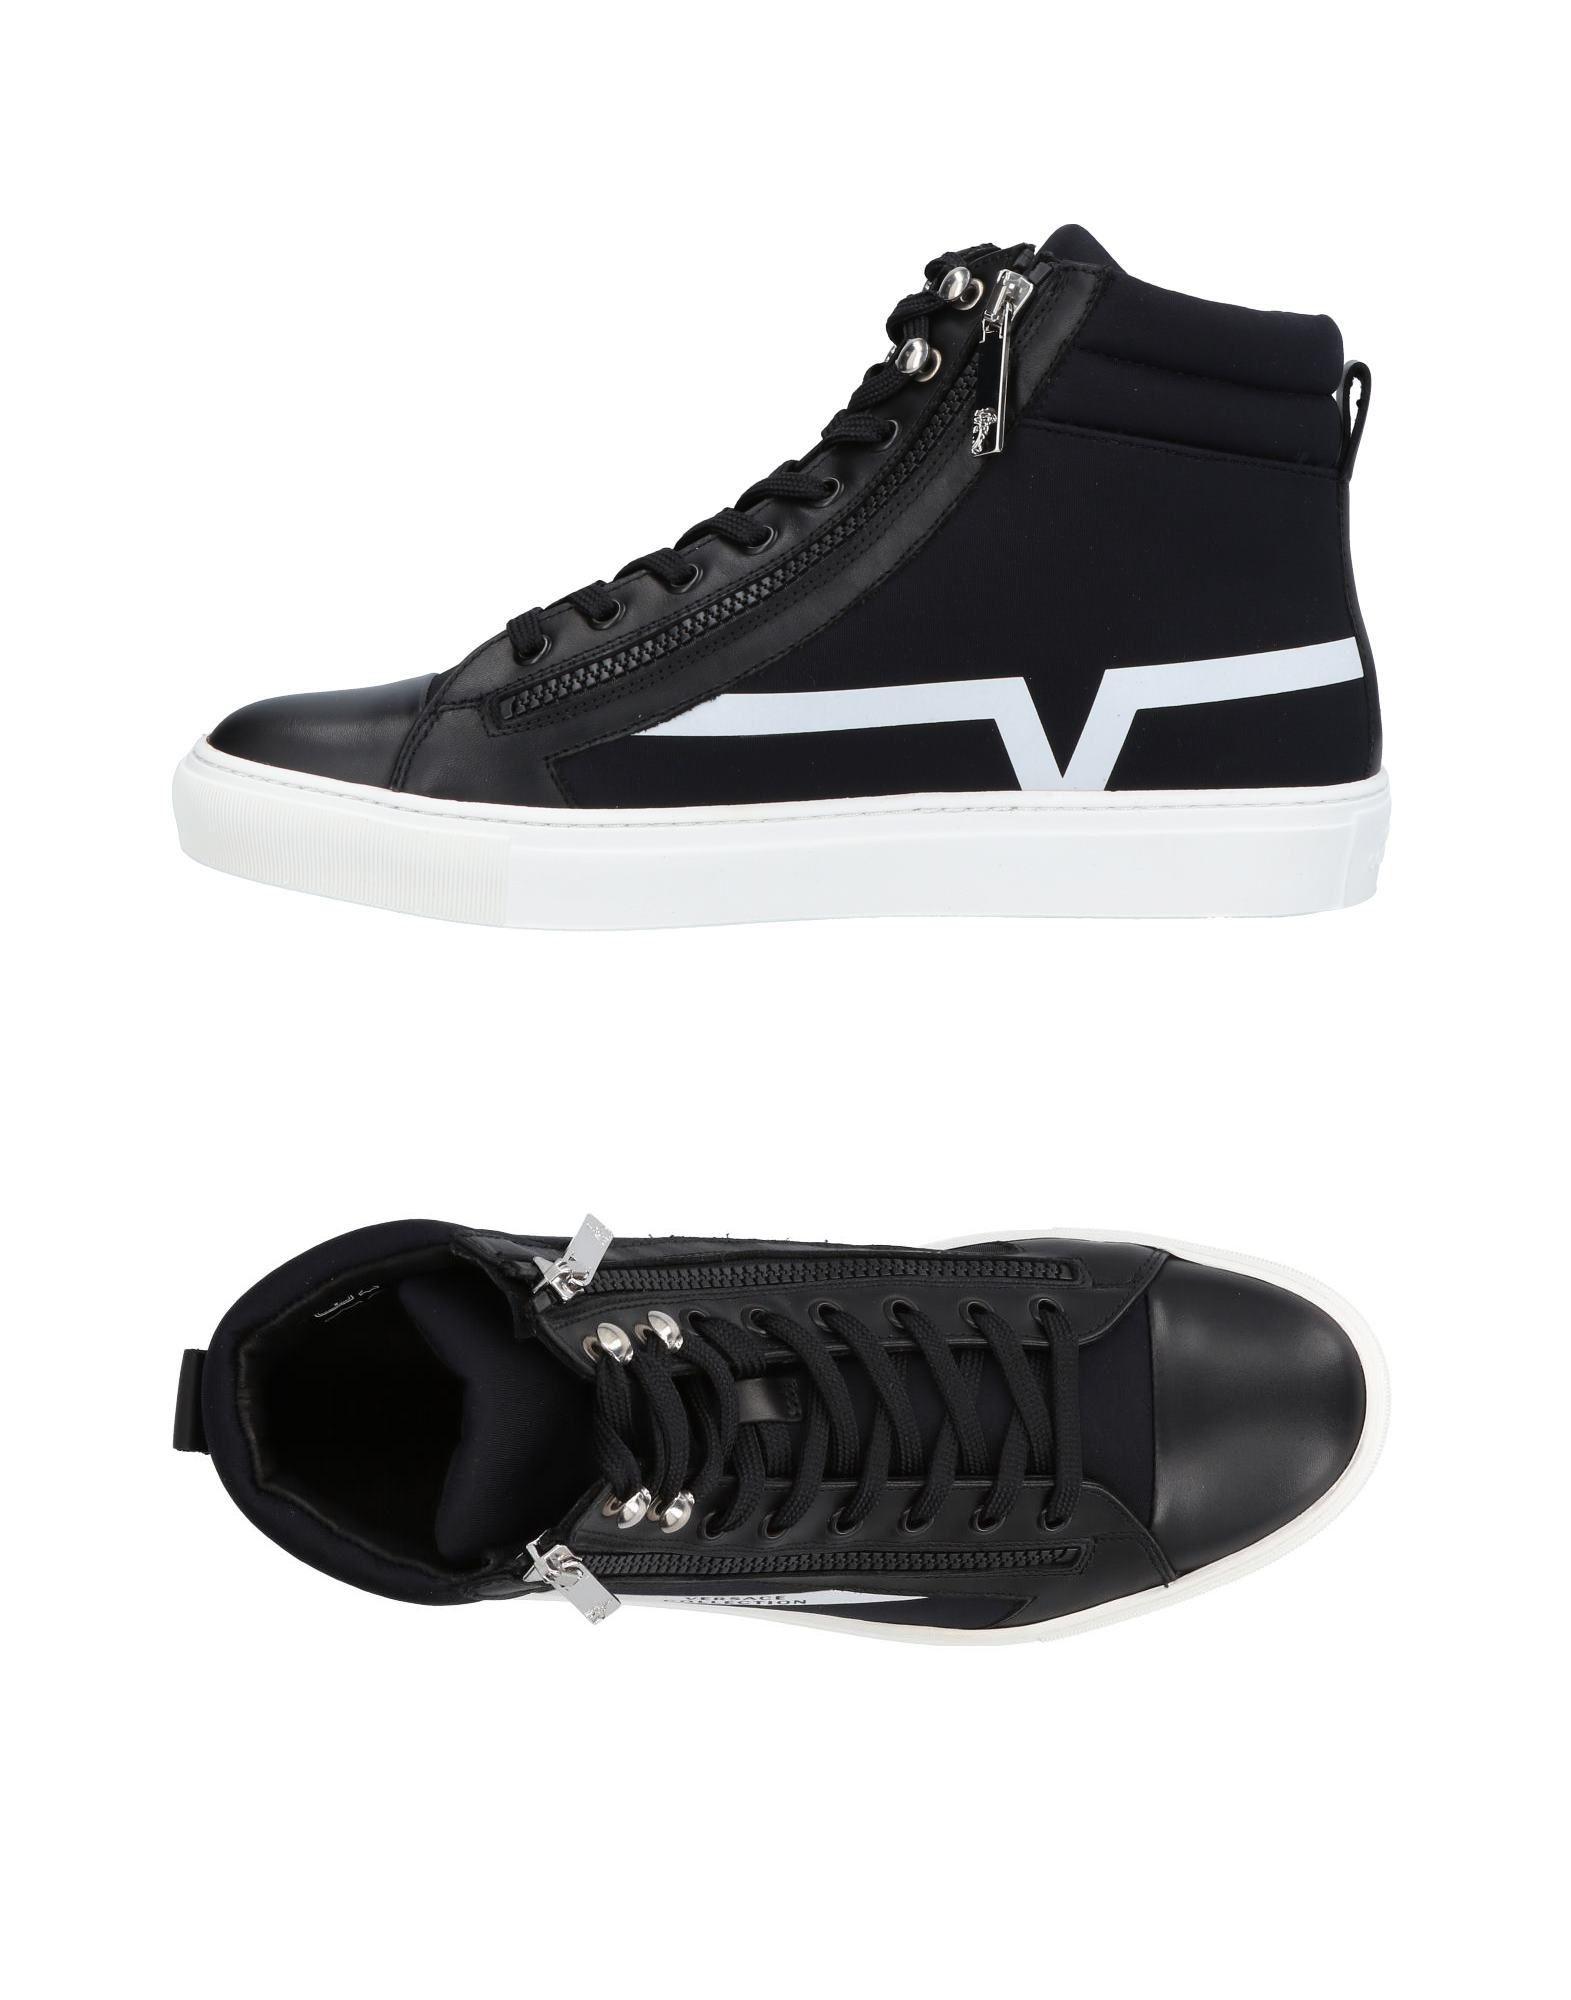 Versace Collection Sneakers Herren  Schuhe 11463346DJ Gute Qualität beliebte Schuhe  eba100